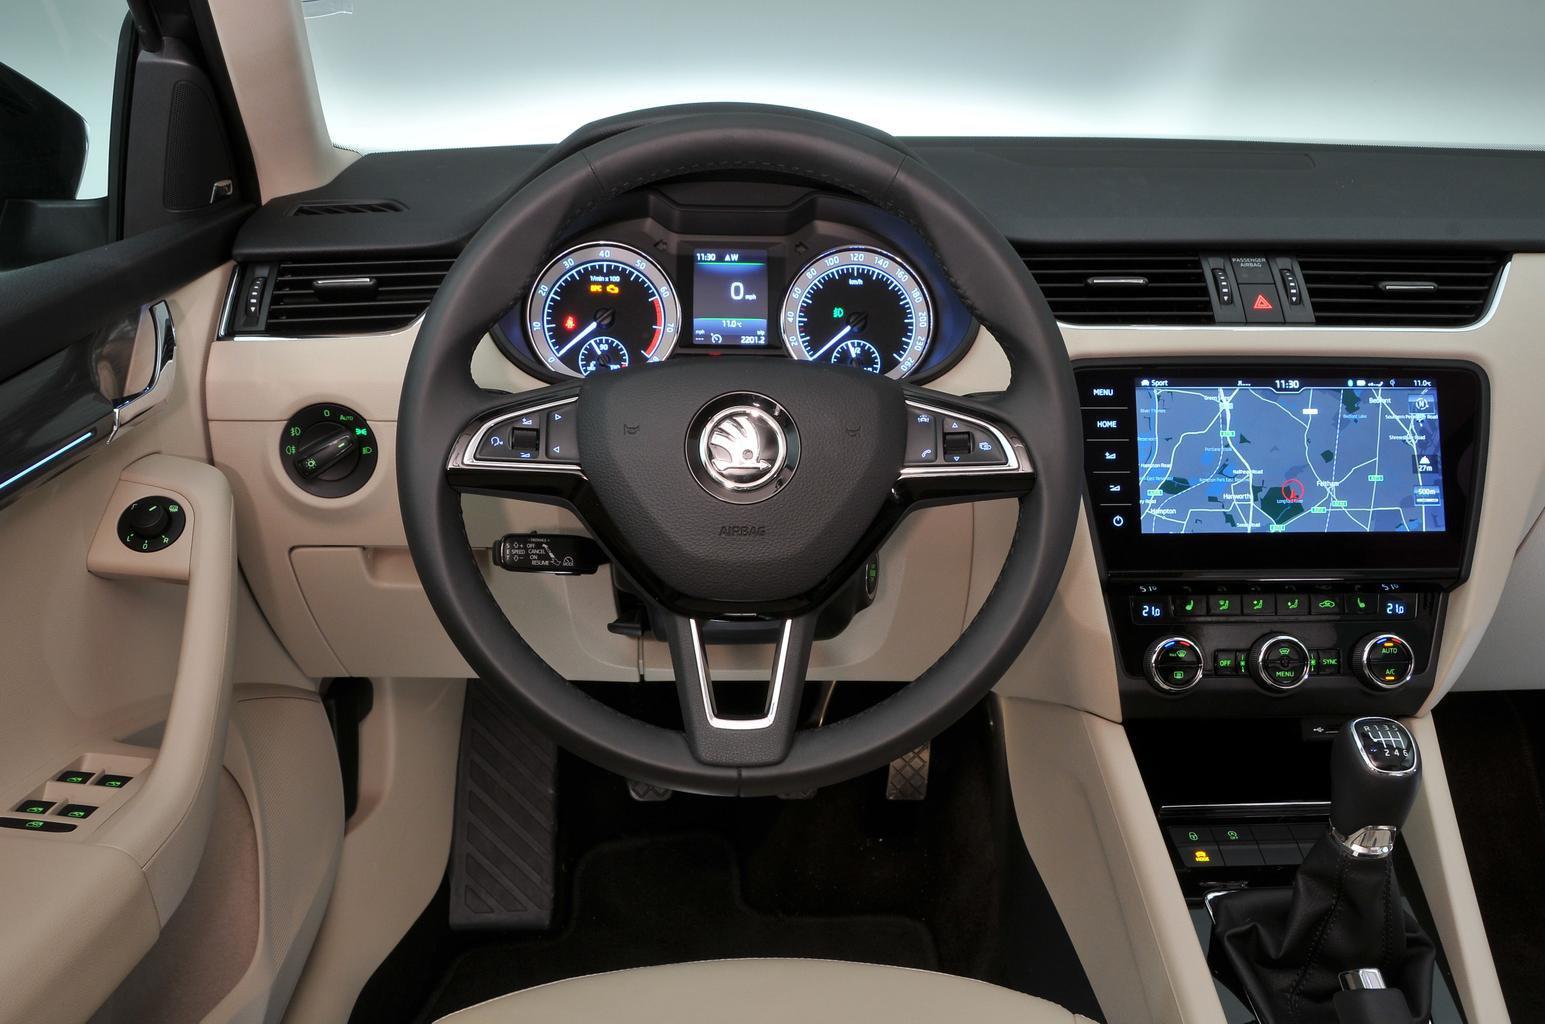 New Hyundai i30 & Skoda Octavia vs Mazda 3